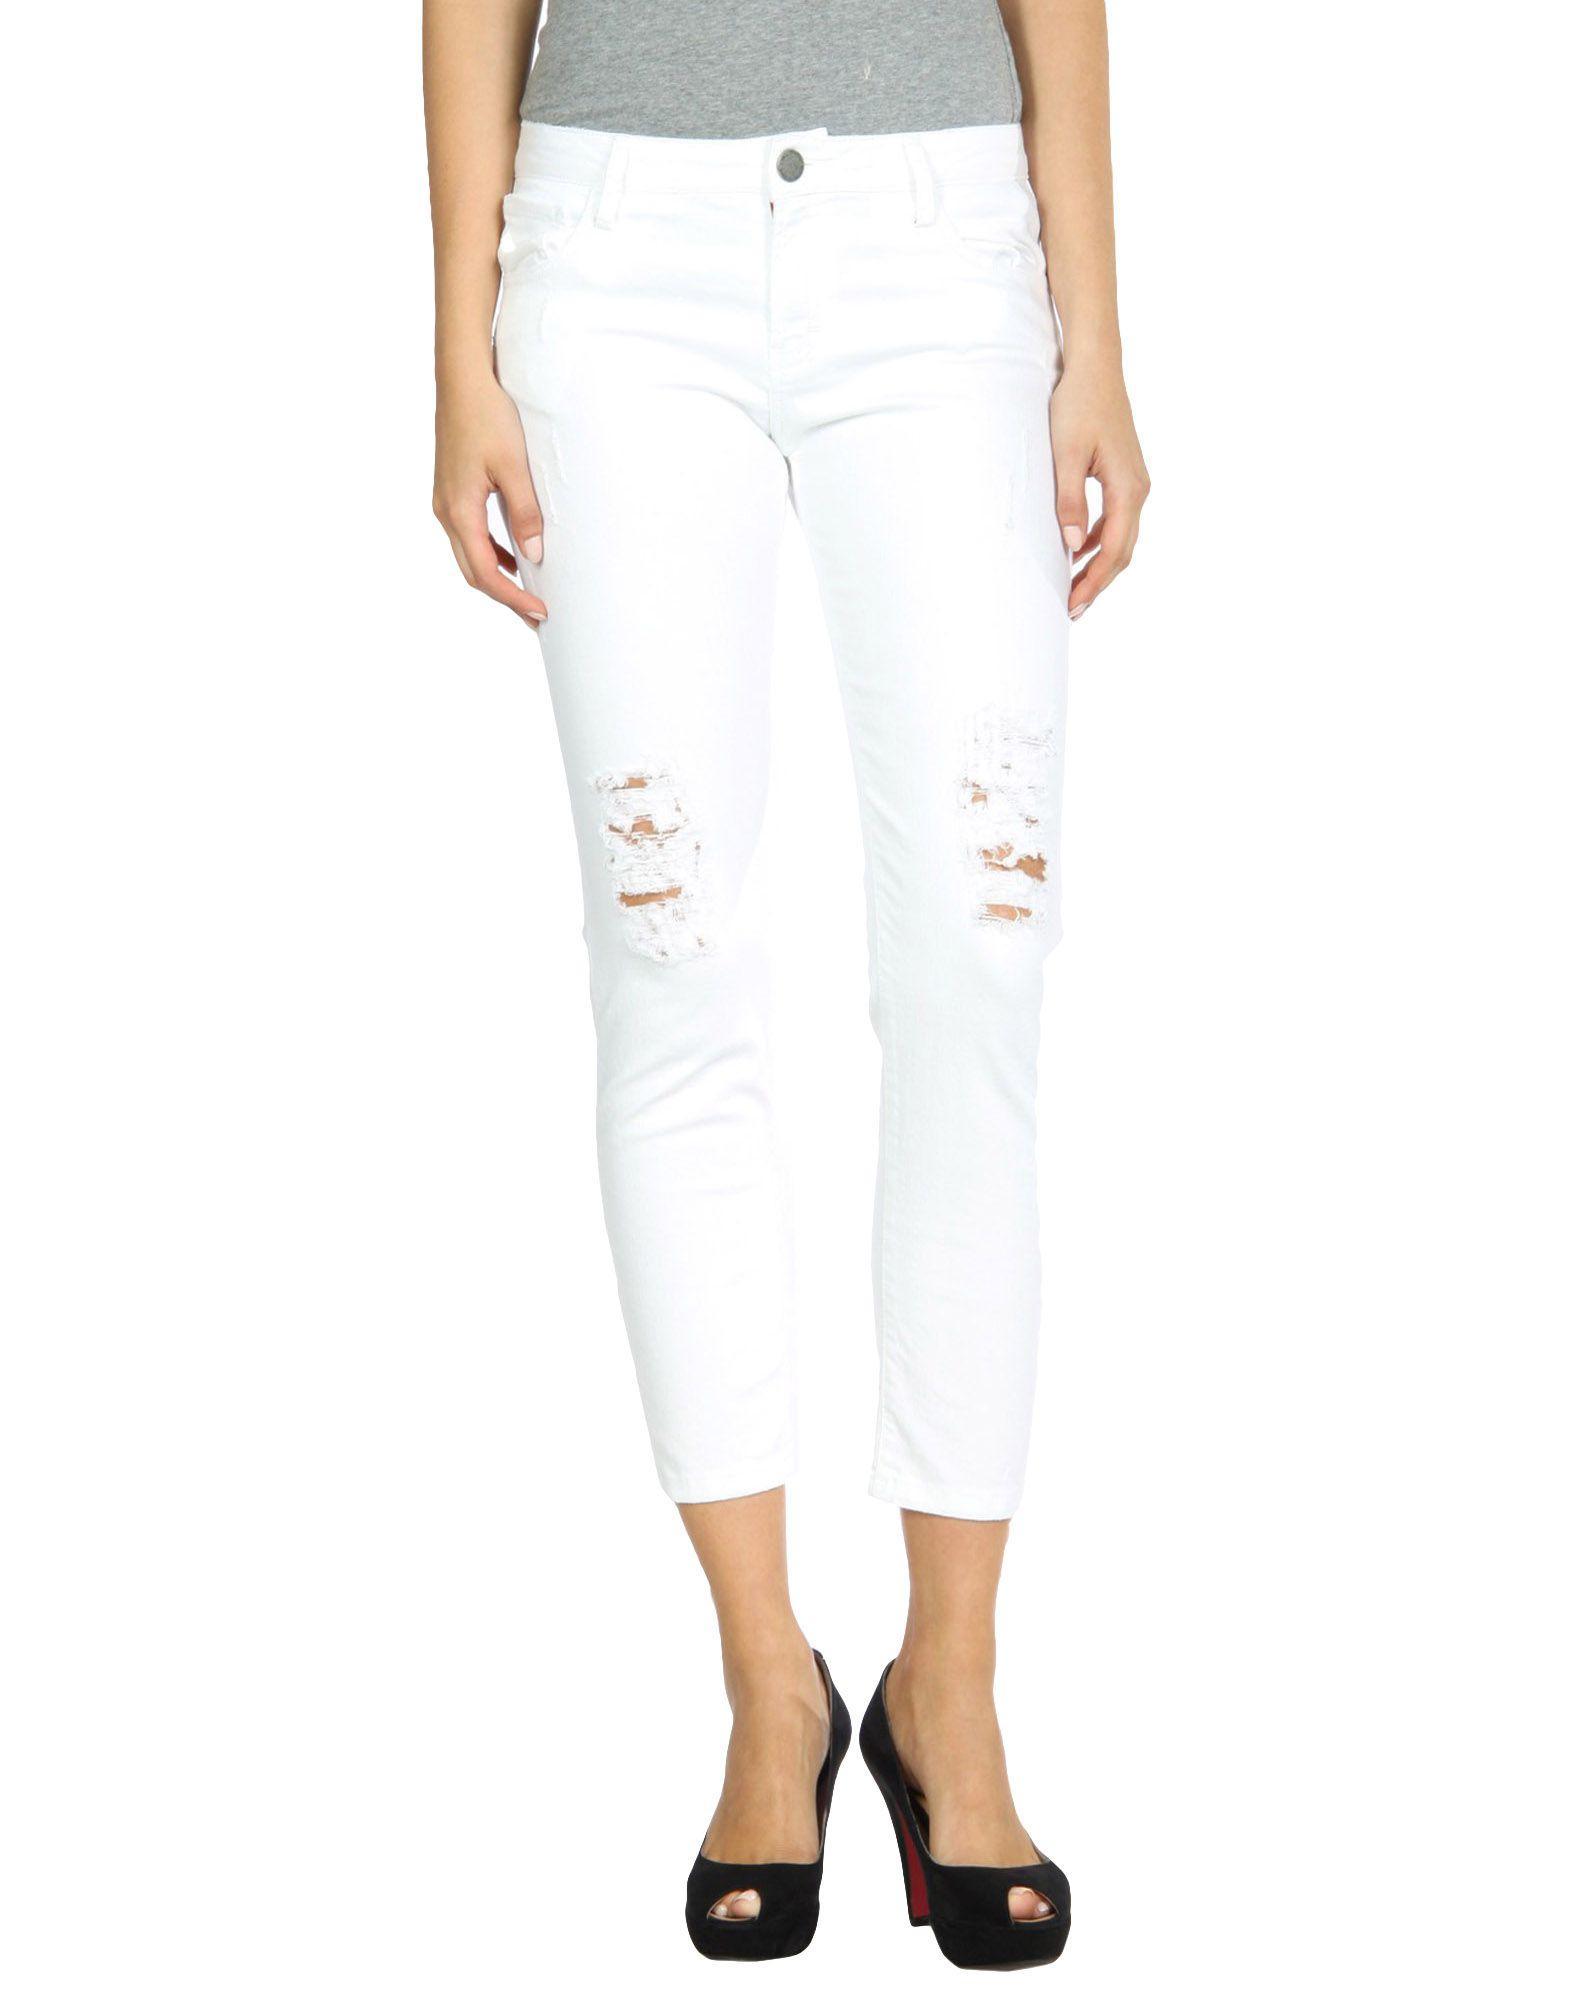 Etienne Marcel Denim Pants In White